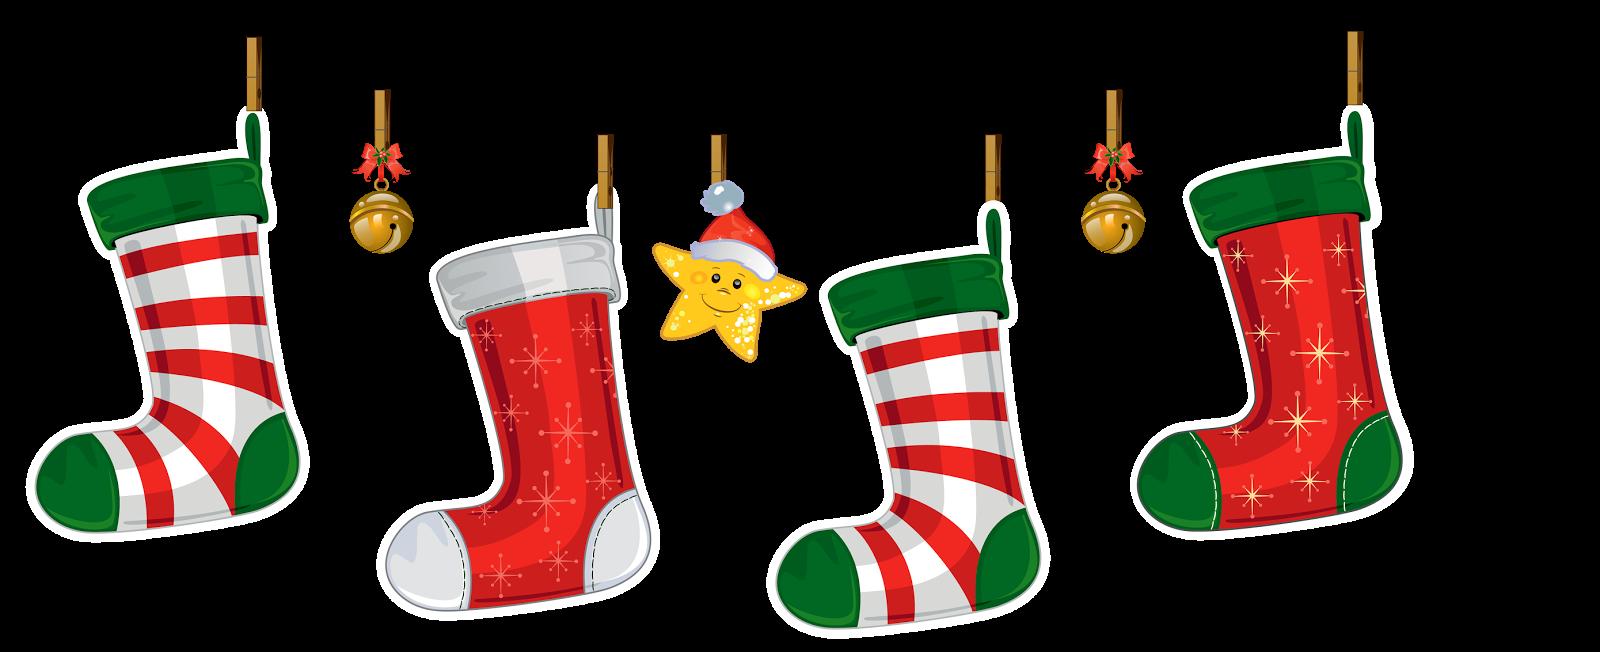 Teacher playground activities and. December clipart holiday break